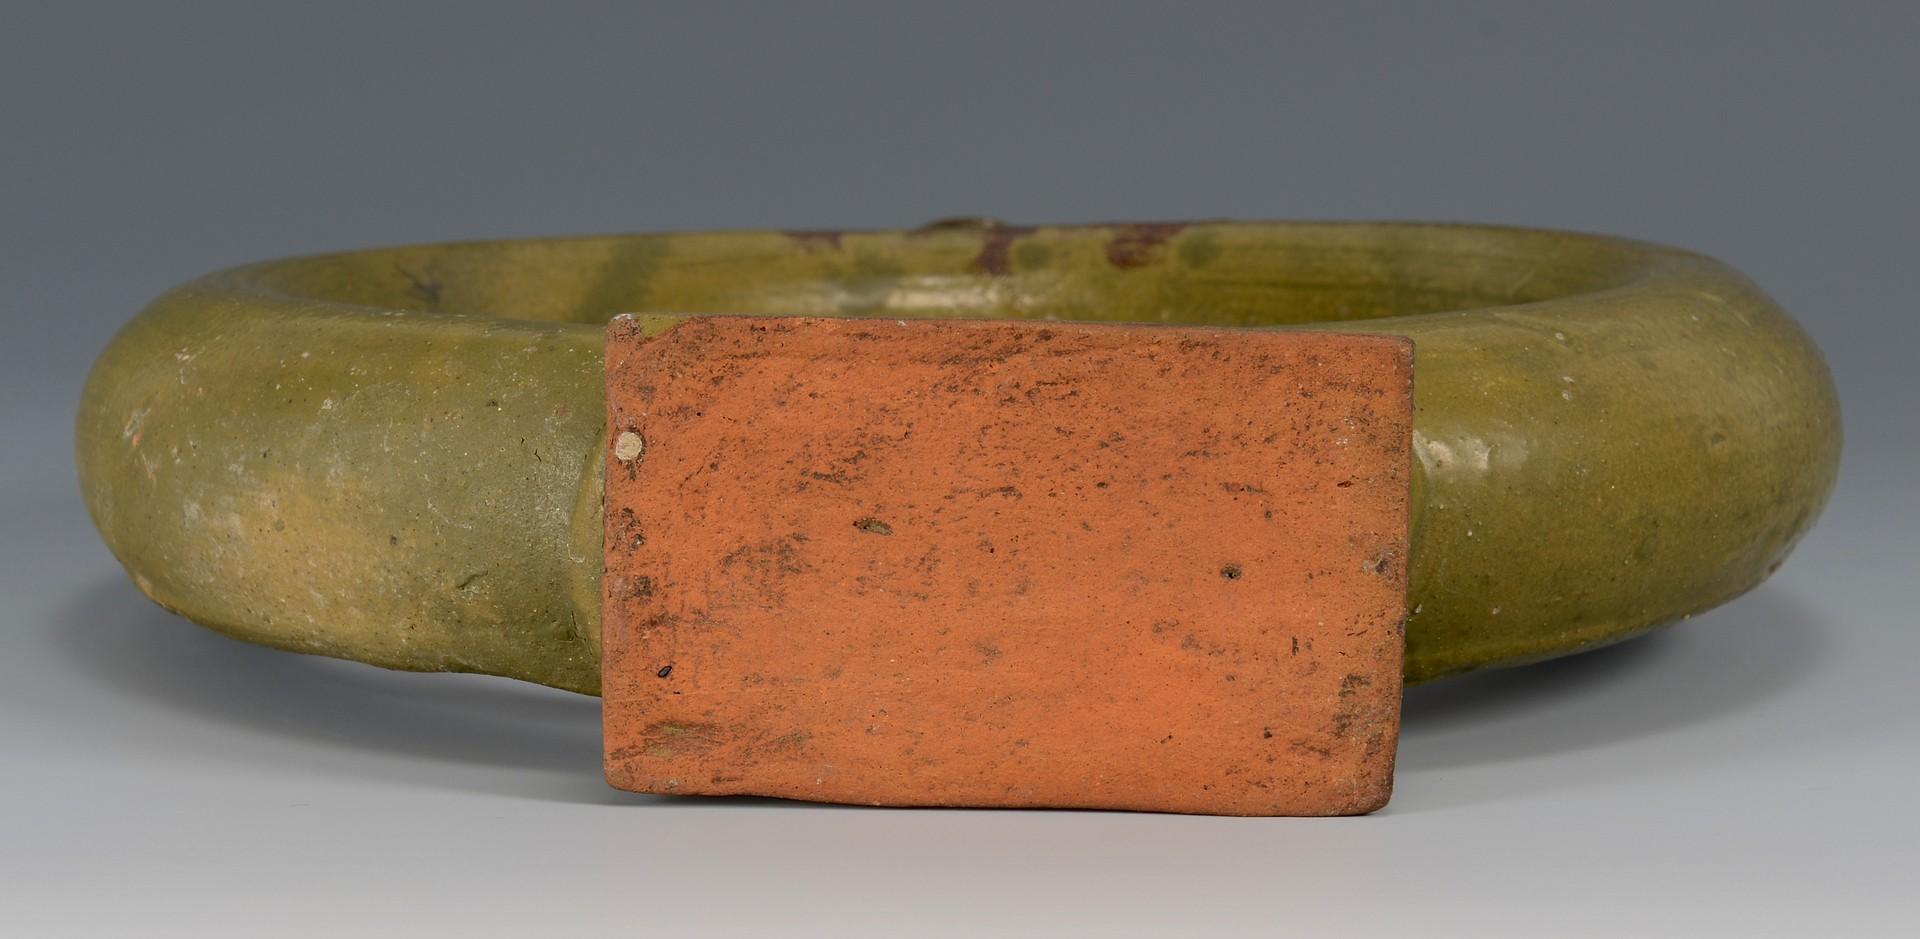 Lot 148: Alabama Stoneware Ring Bottle with Footed Base